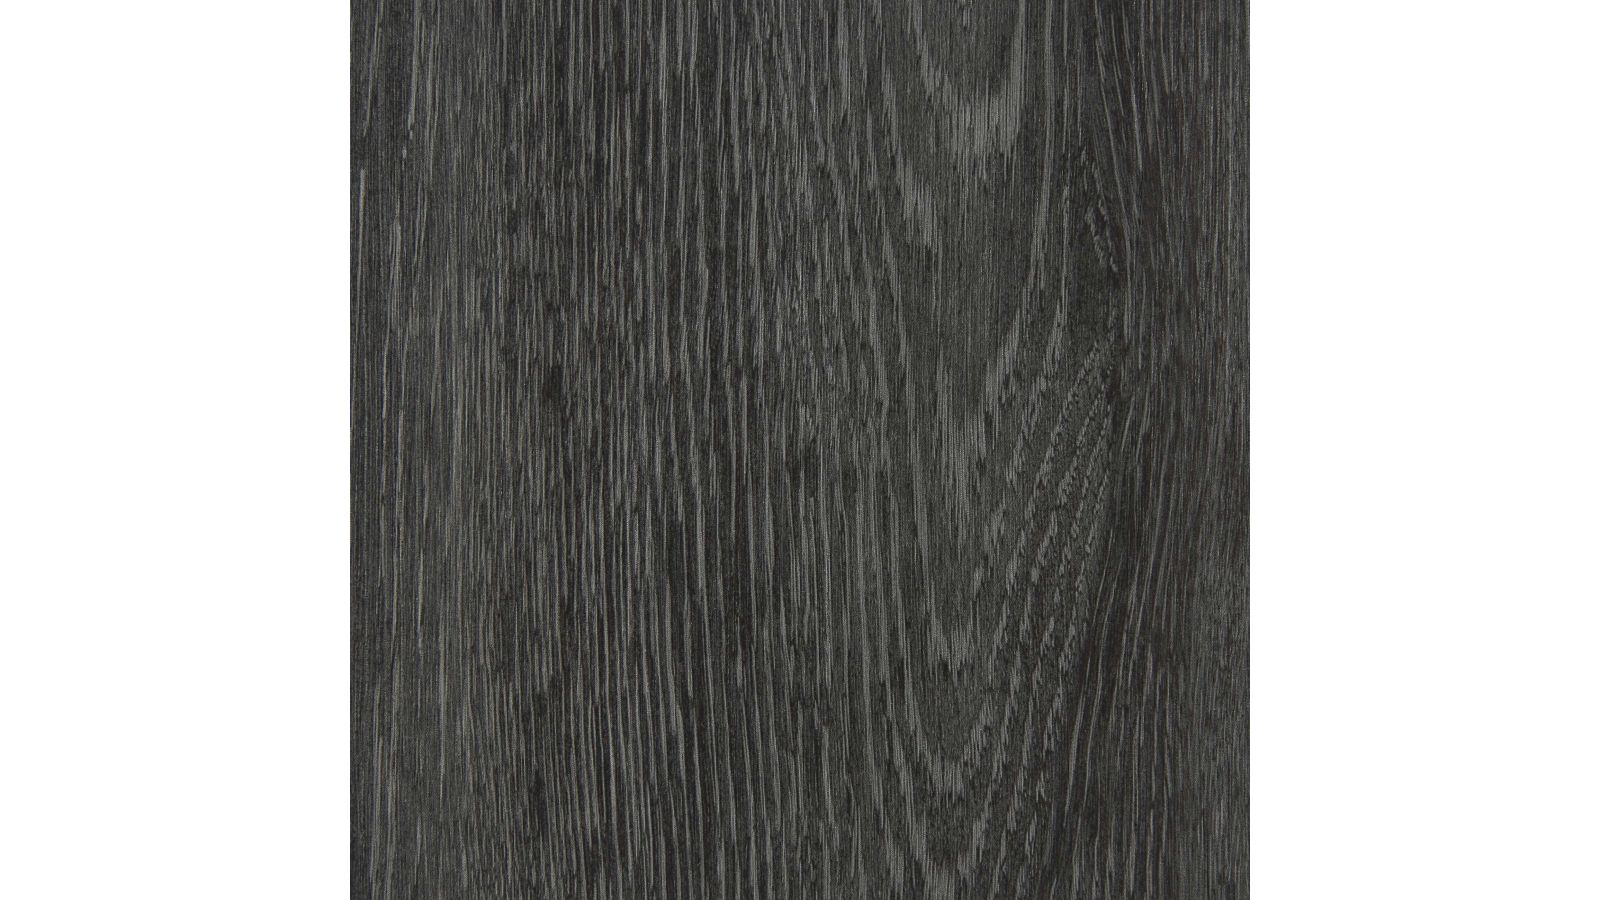 Rustic Wood RW27